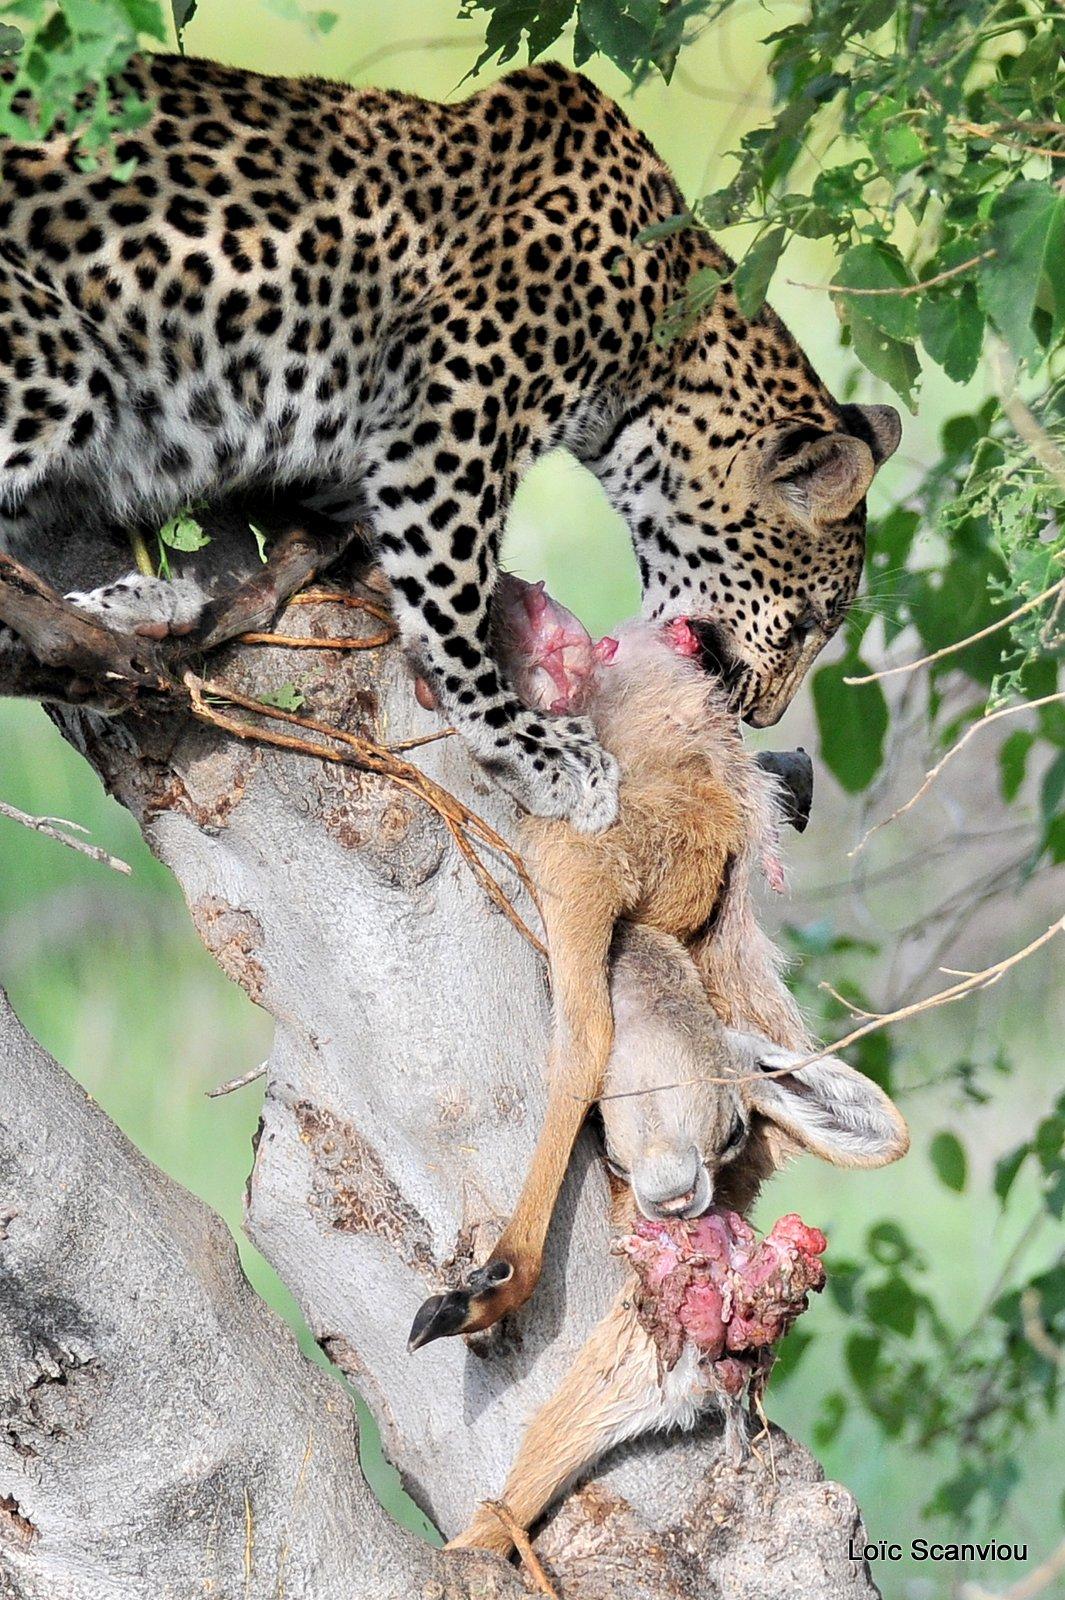 Léopard qui mange/Leopard eating (7)